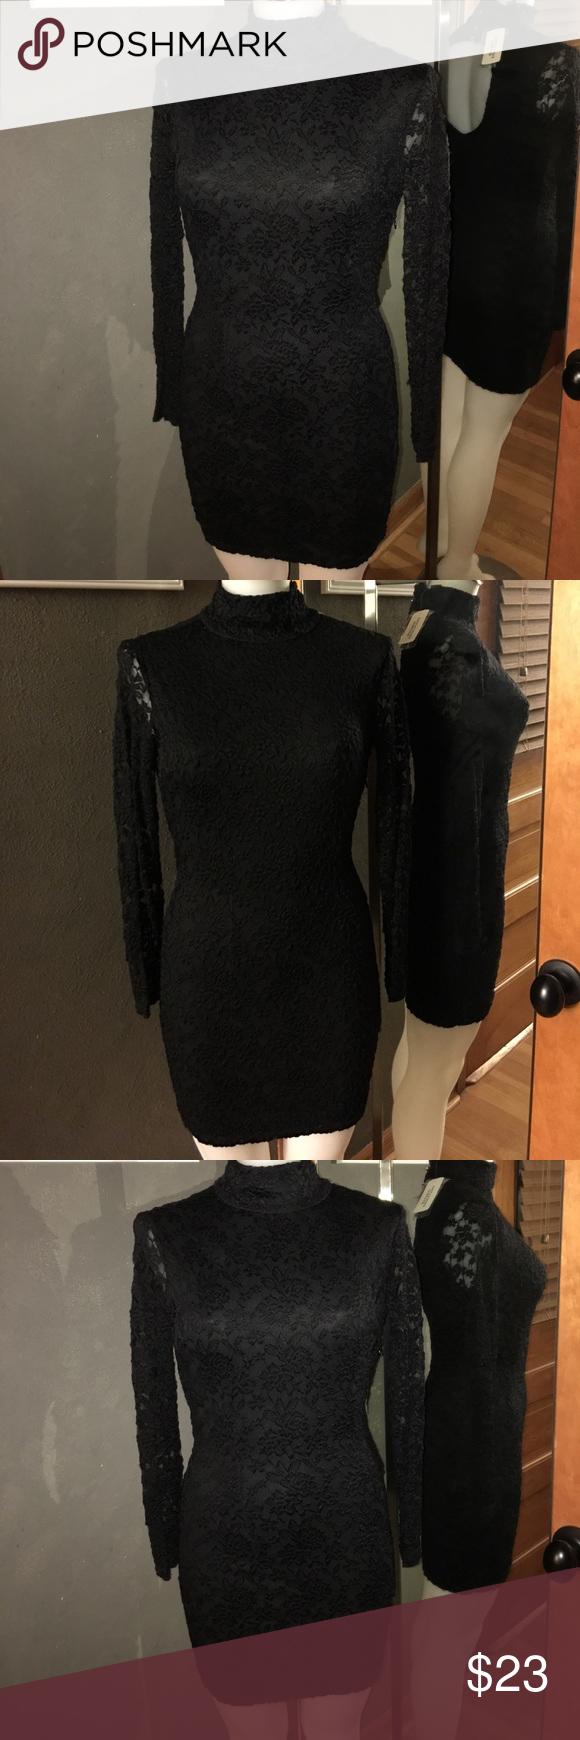 Nwt cutout back black lace dress high collar lace dress black and